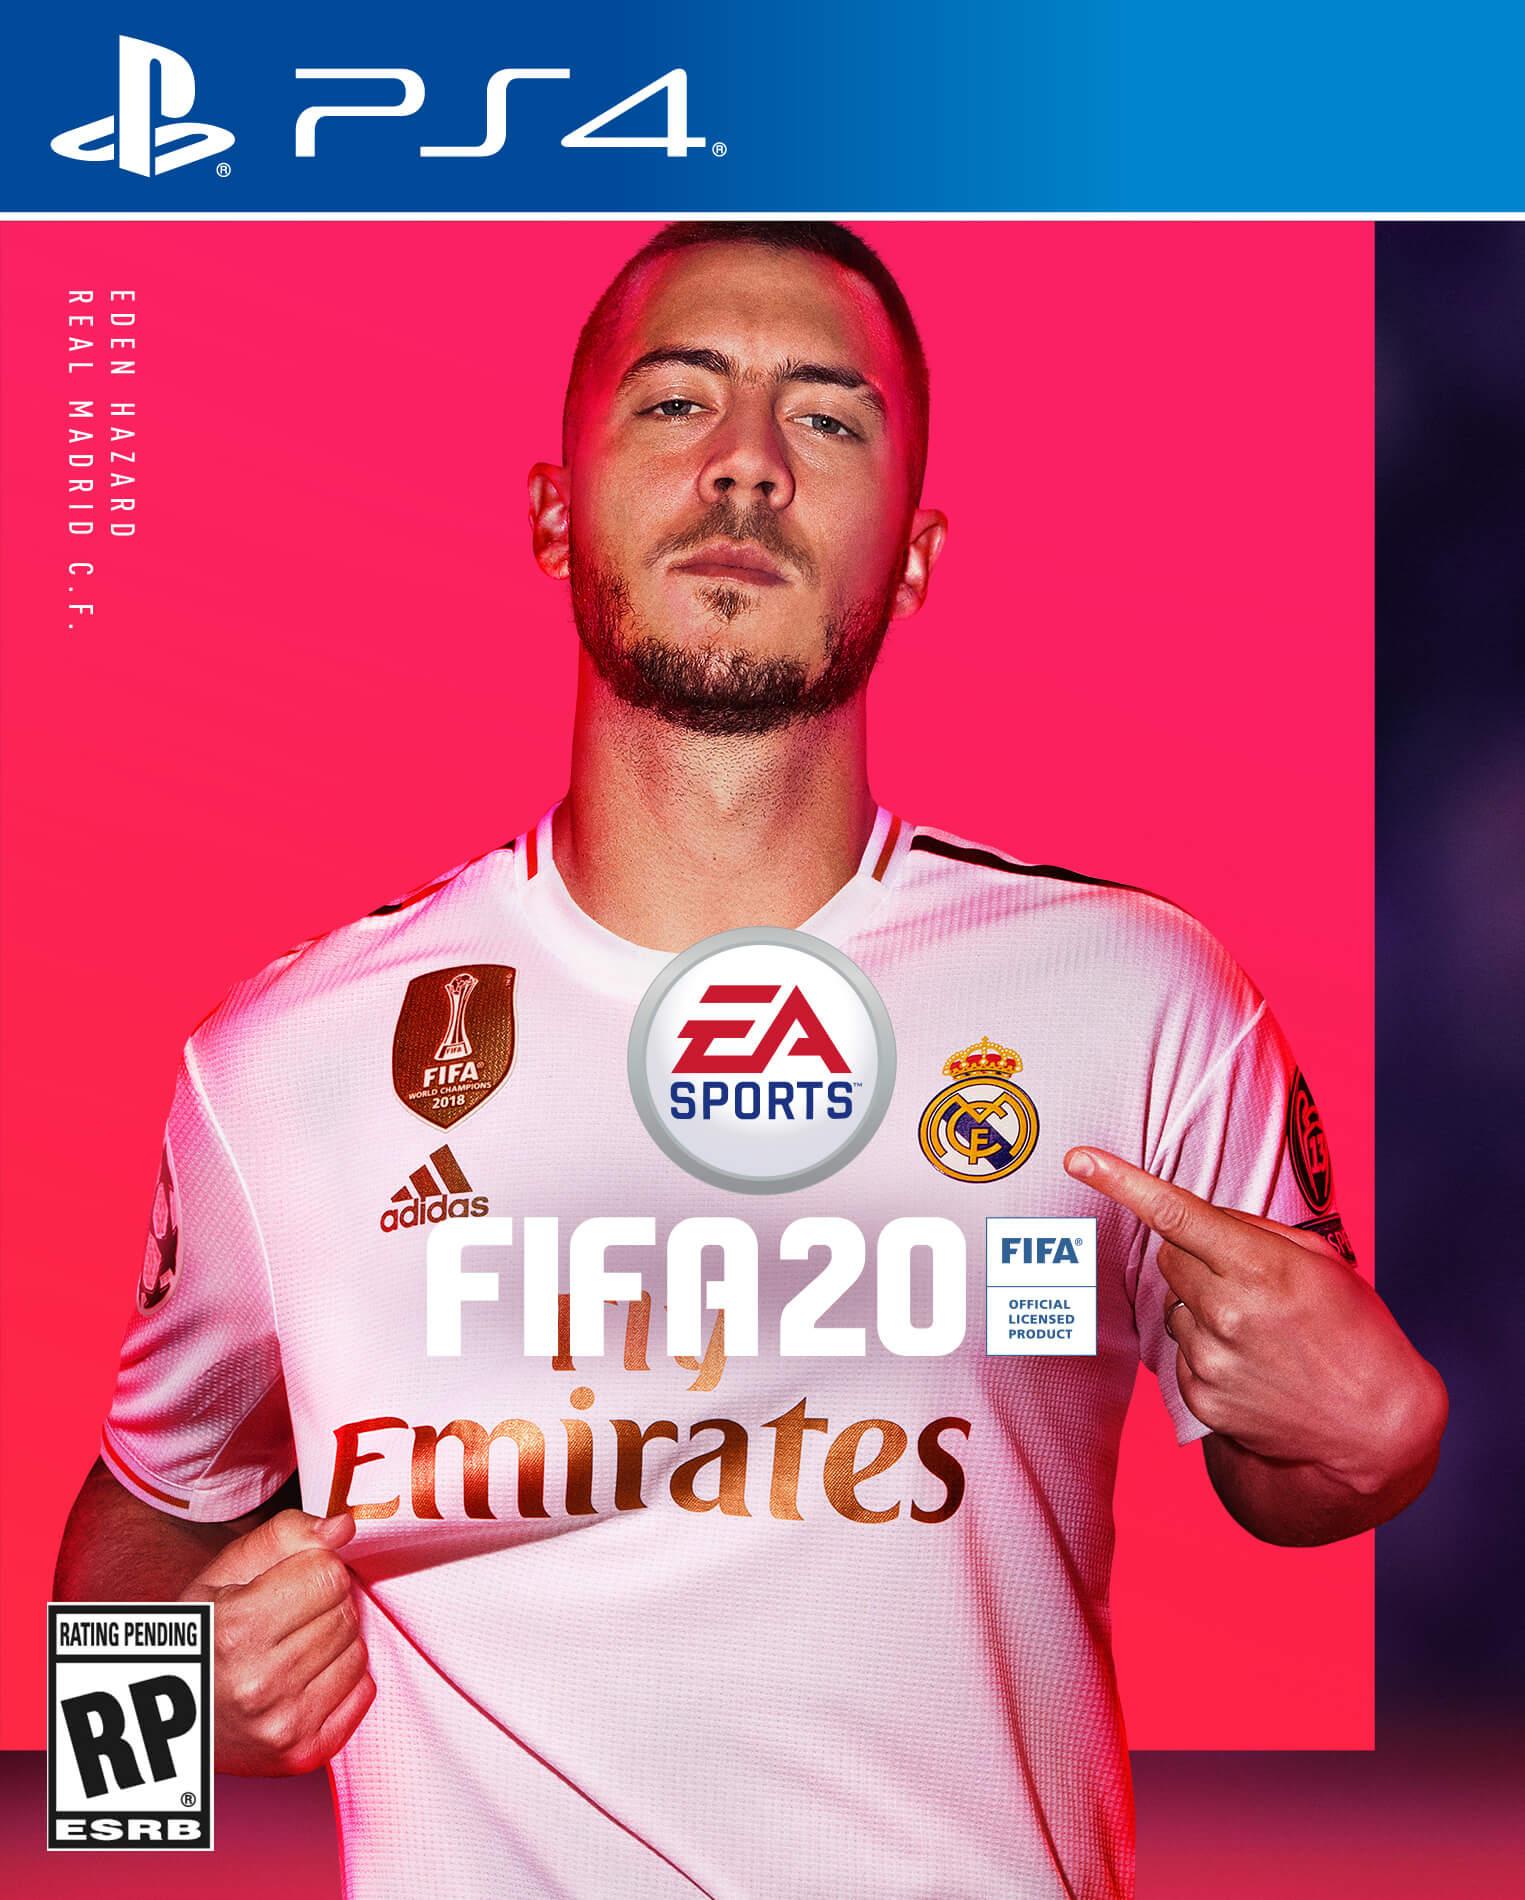 portada de FIFA 20